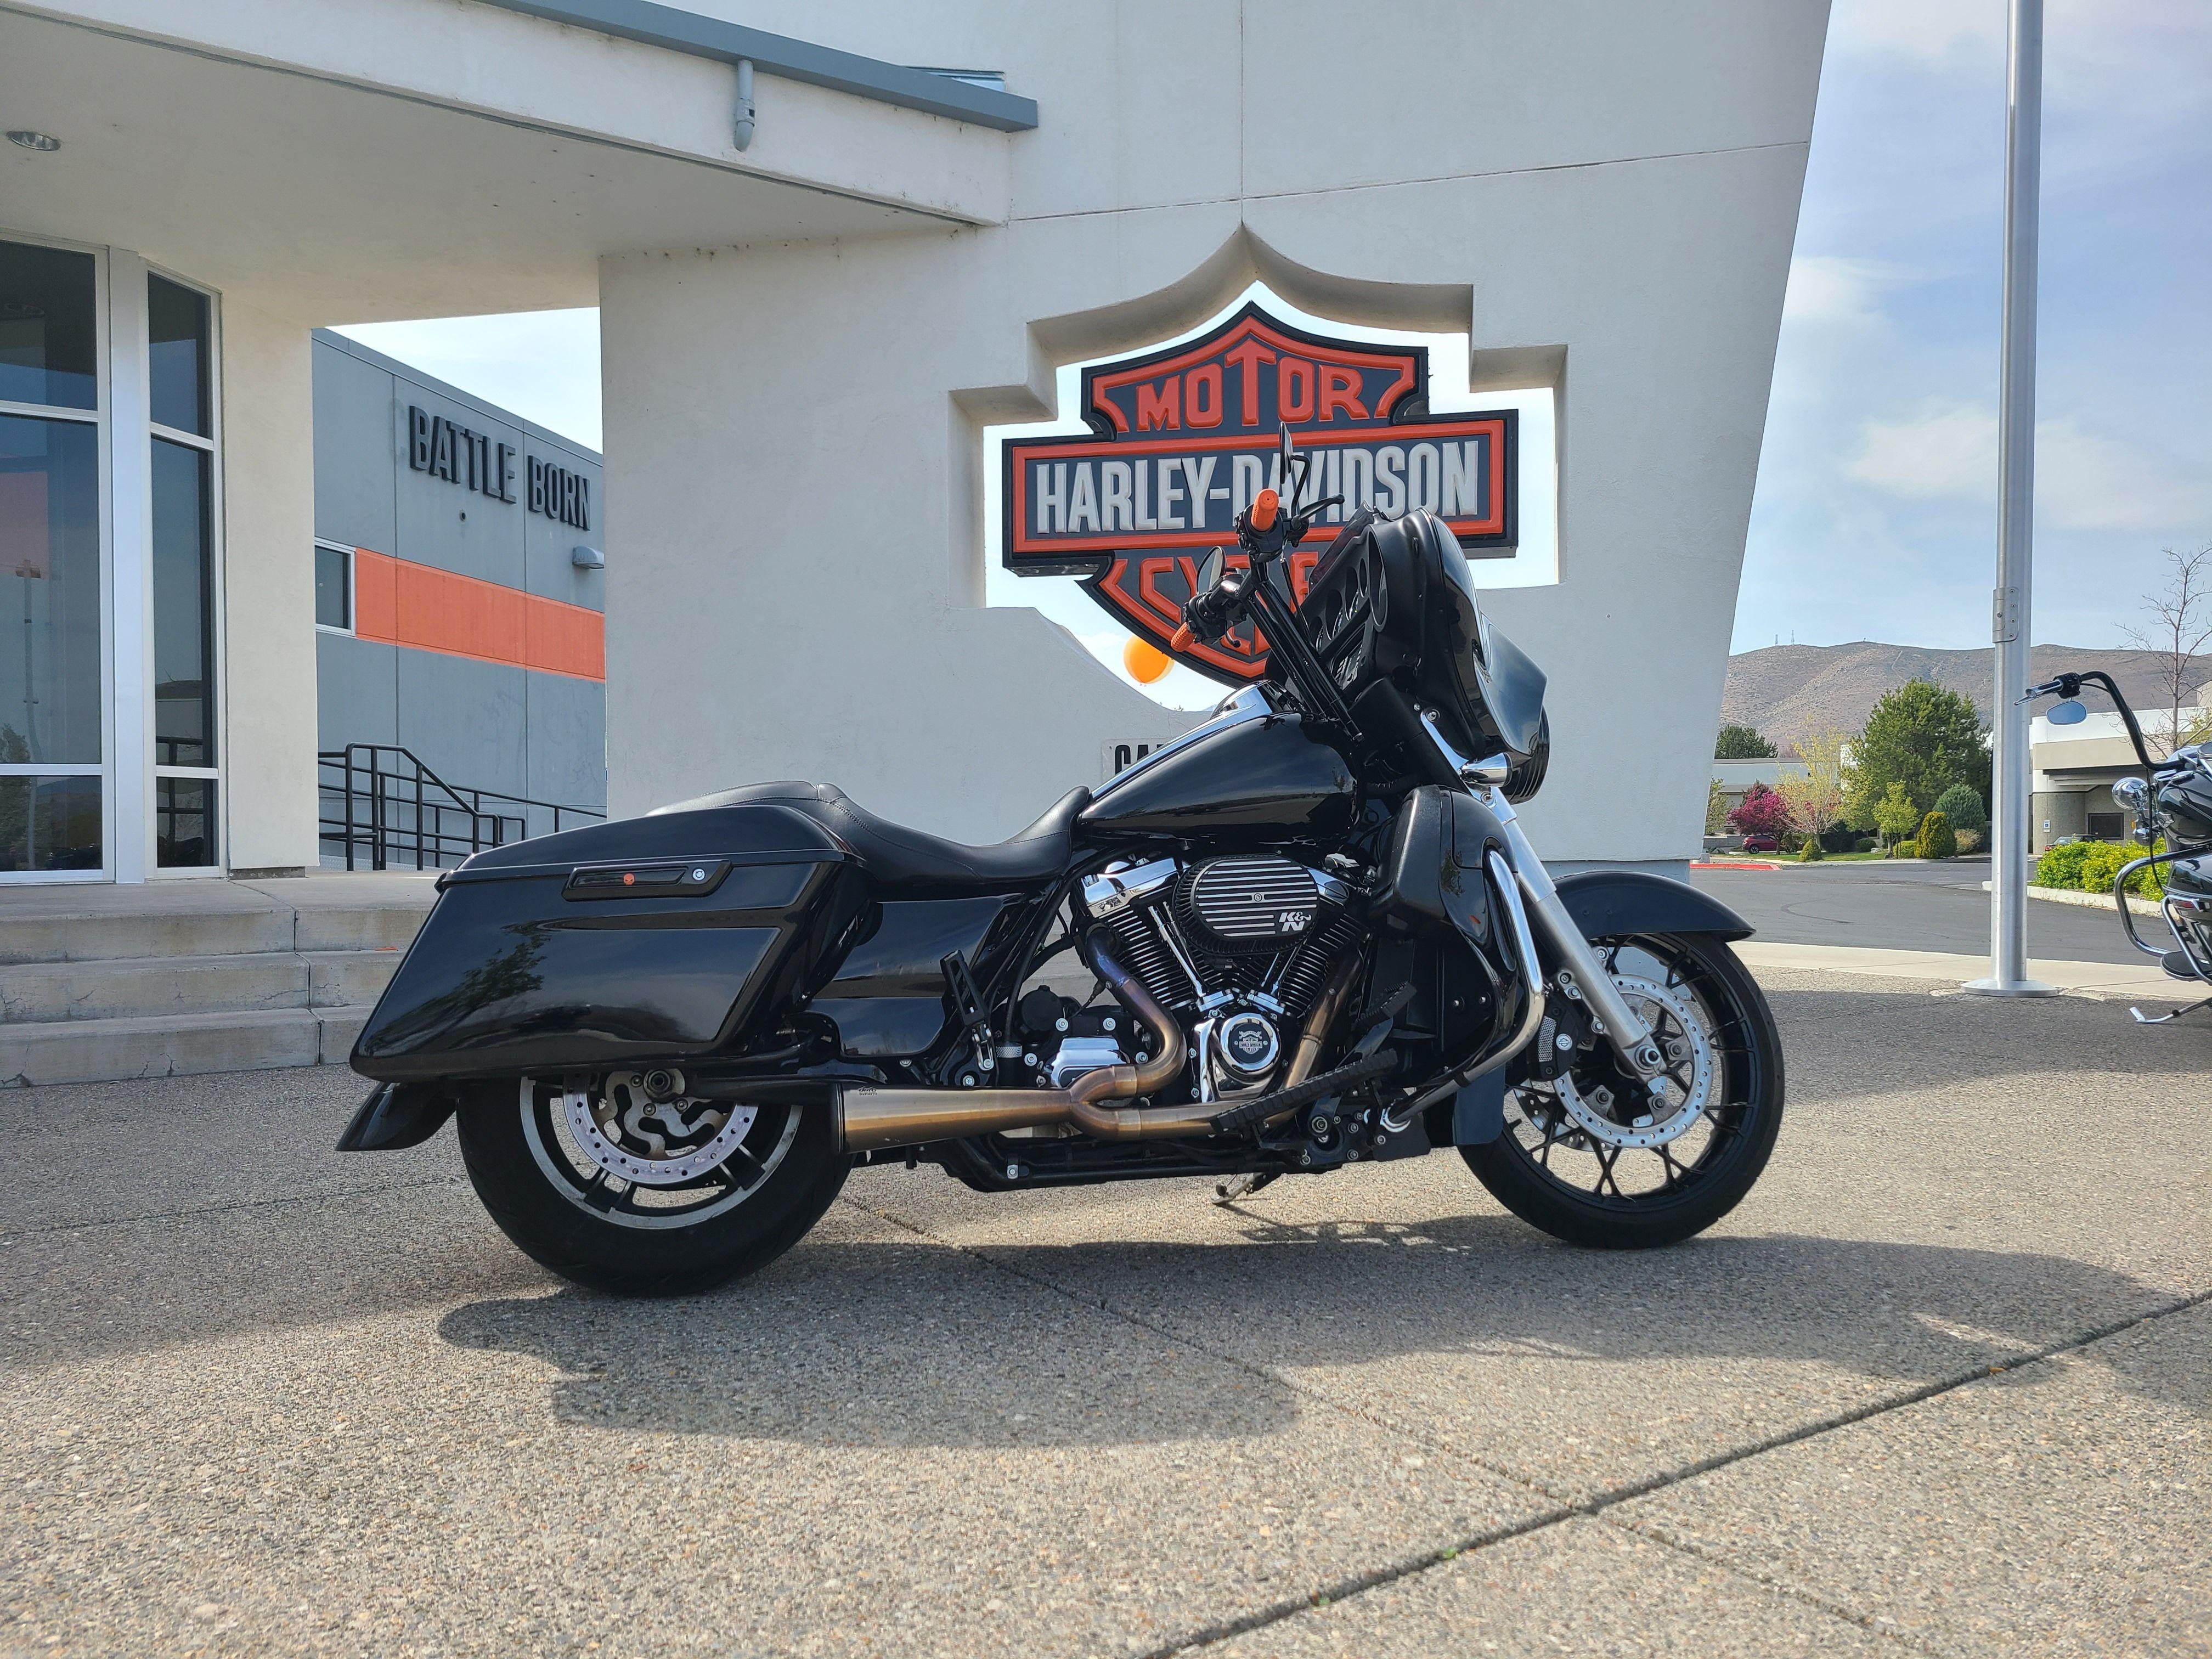 2017 Harley-Davidson Street Glide FLHX